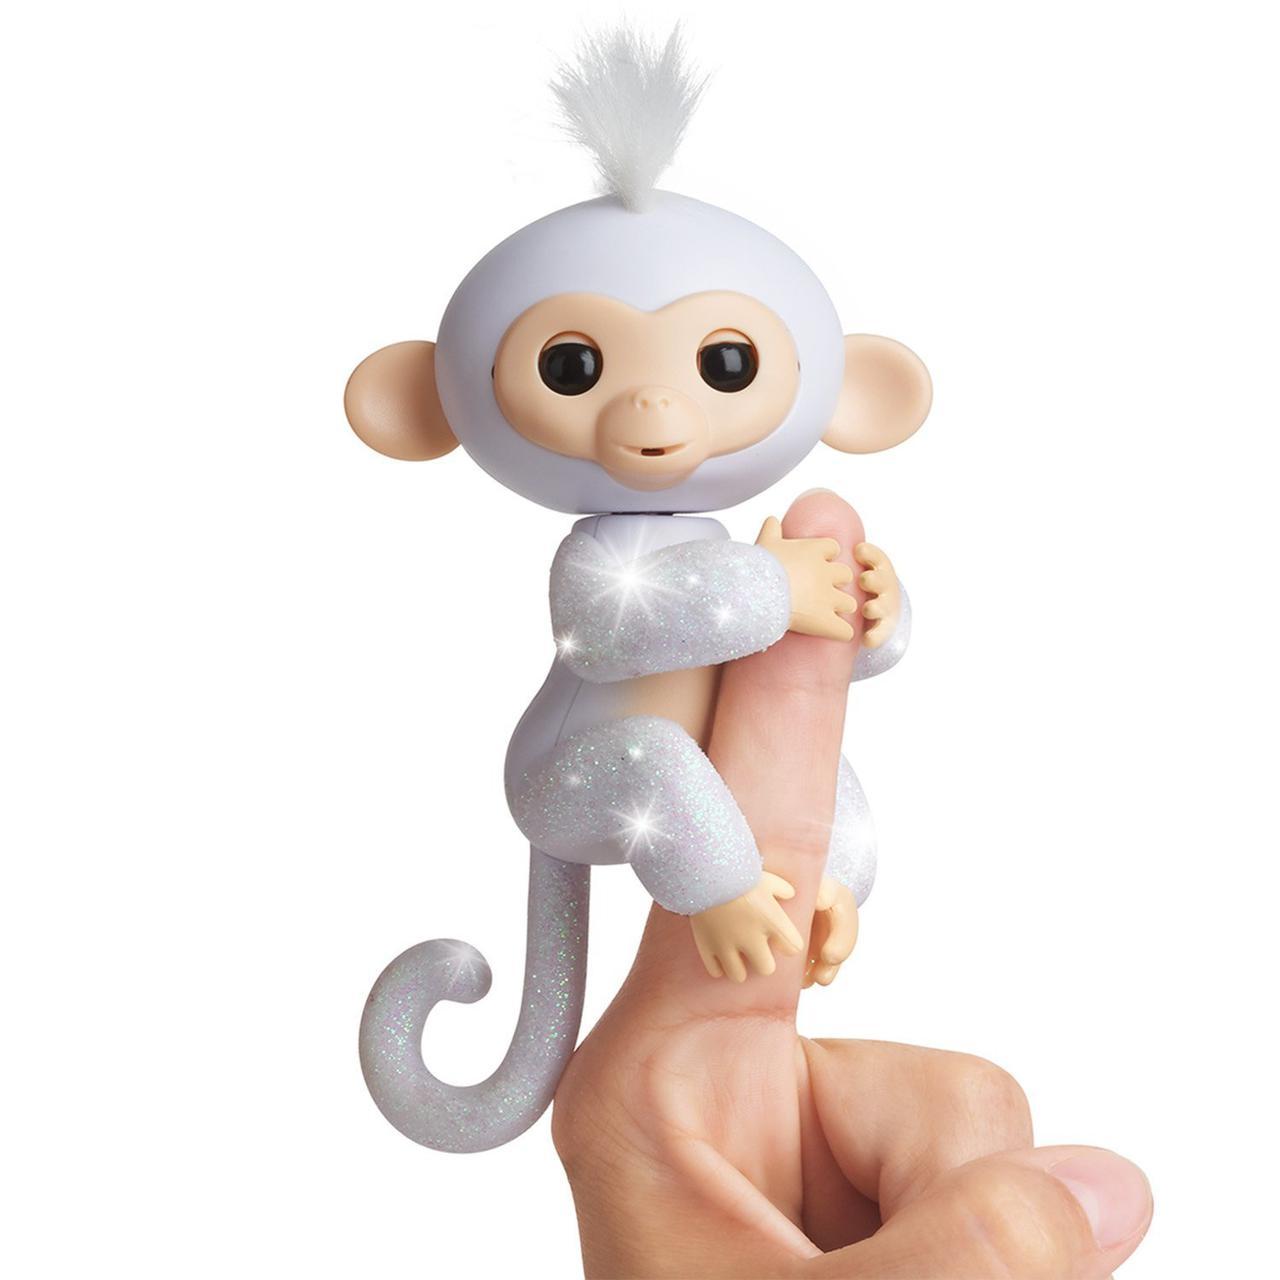 Интерактивная обезьянка на пальчик, блестящая, WowWee Fingerlings Glitter Monkey  Оригинал из США